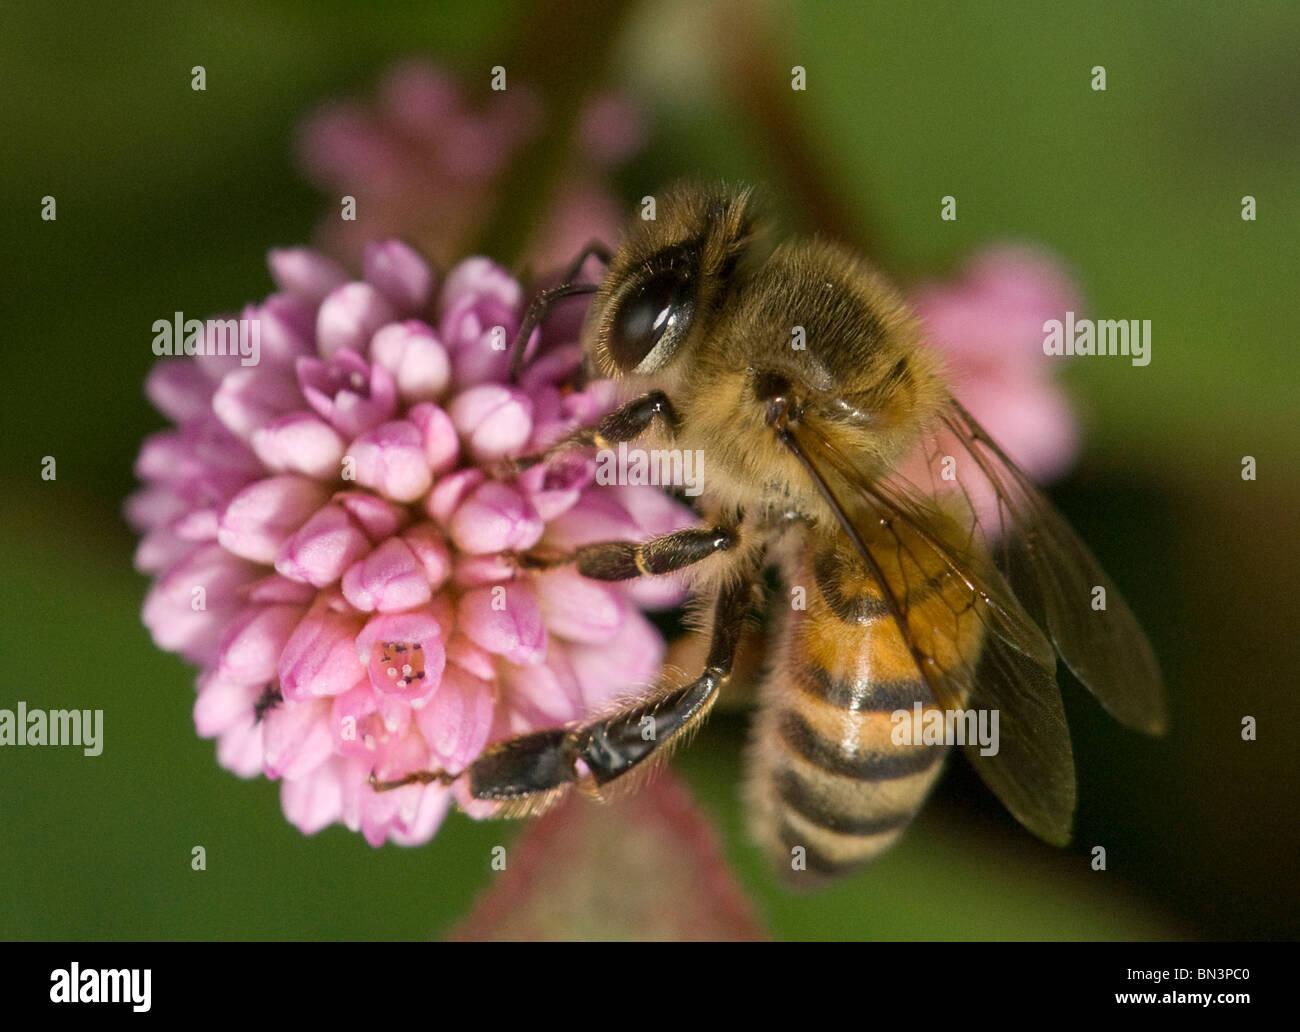 honeybee foraging on a flower - Stock Image